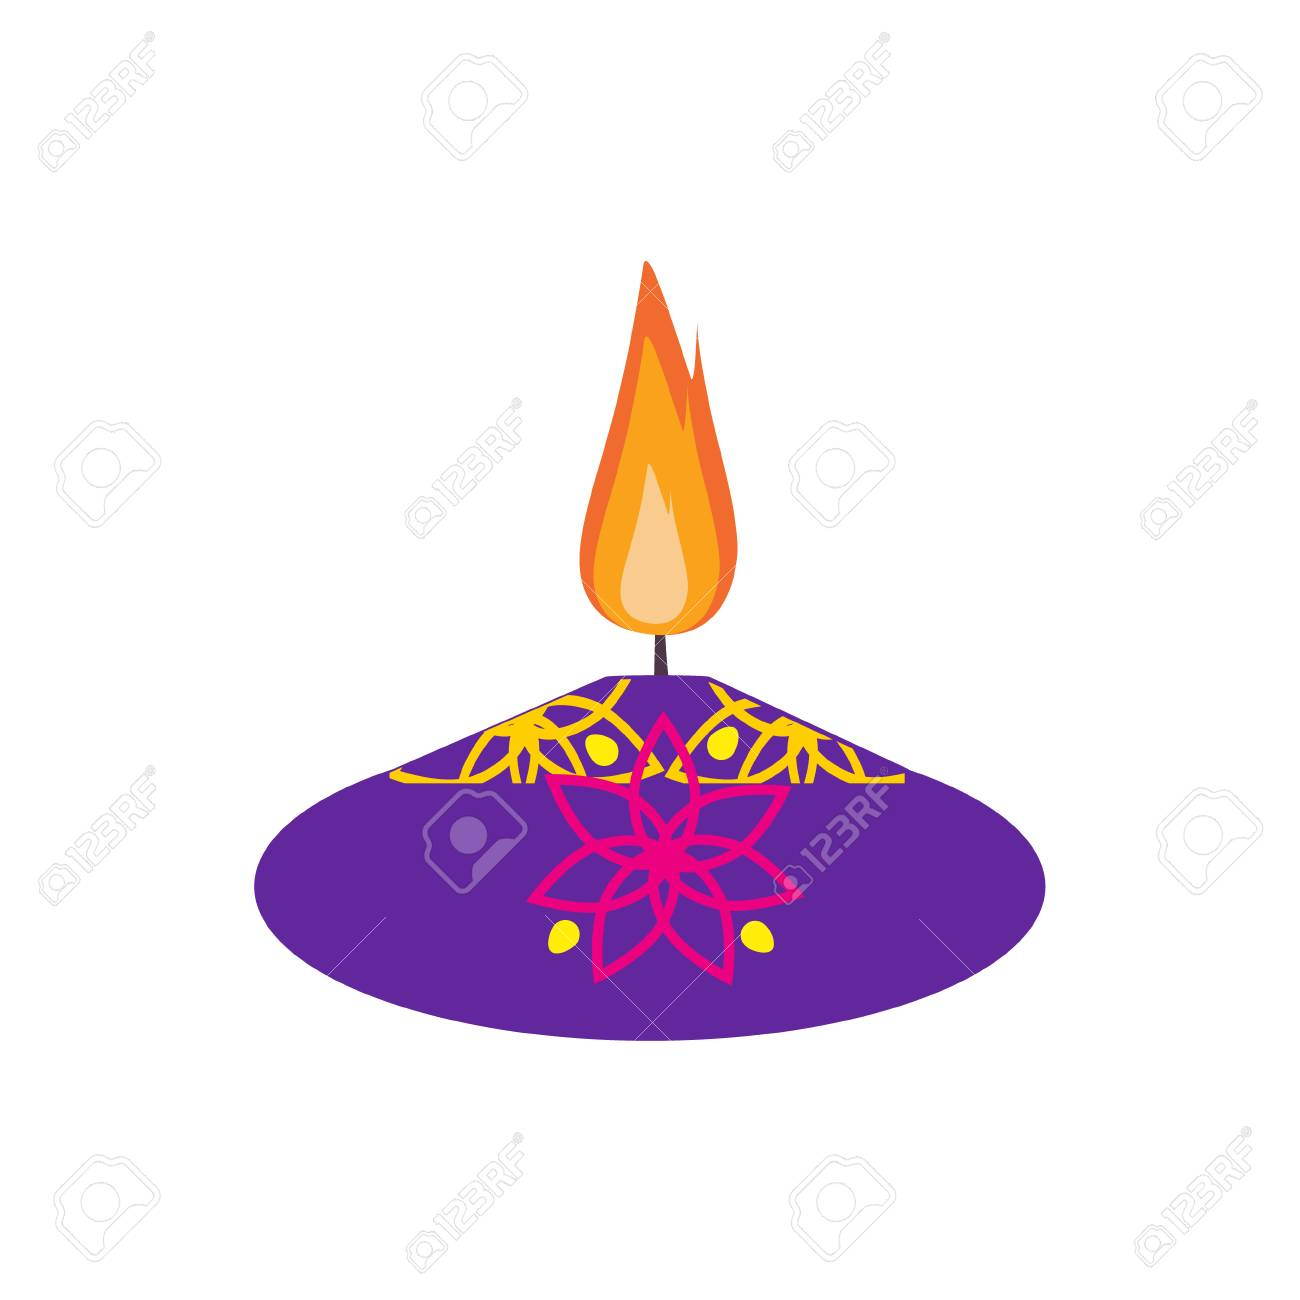 Raster illustration diya lamp lit during diwali festival happy illustration raster illustration diya lamp lit during diwali festival happy diwali greetings card design indian hindu festival of lights called diwali m4hsunfo